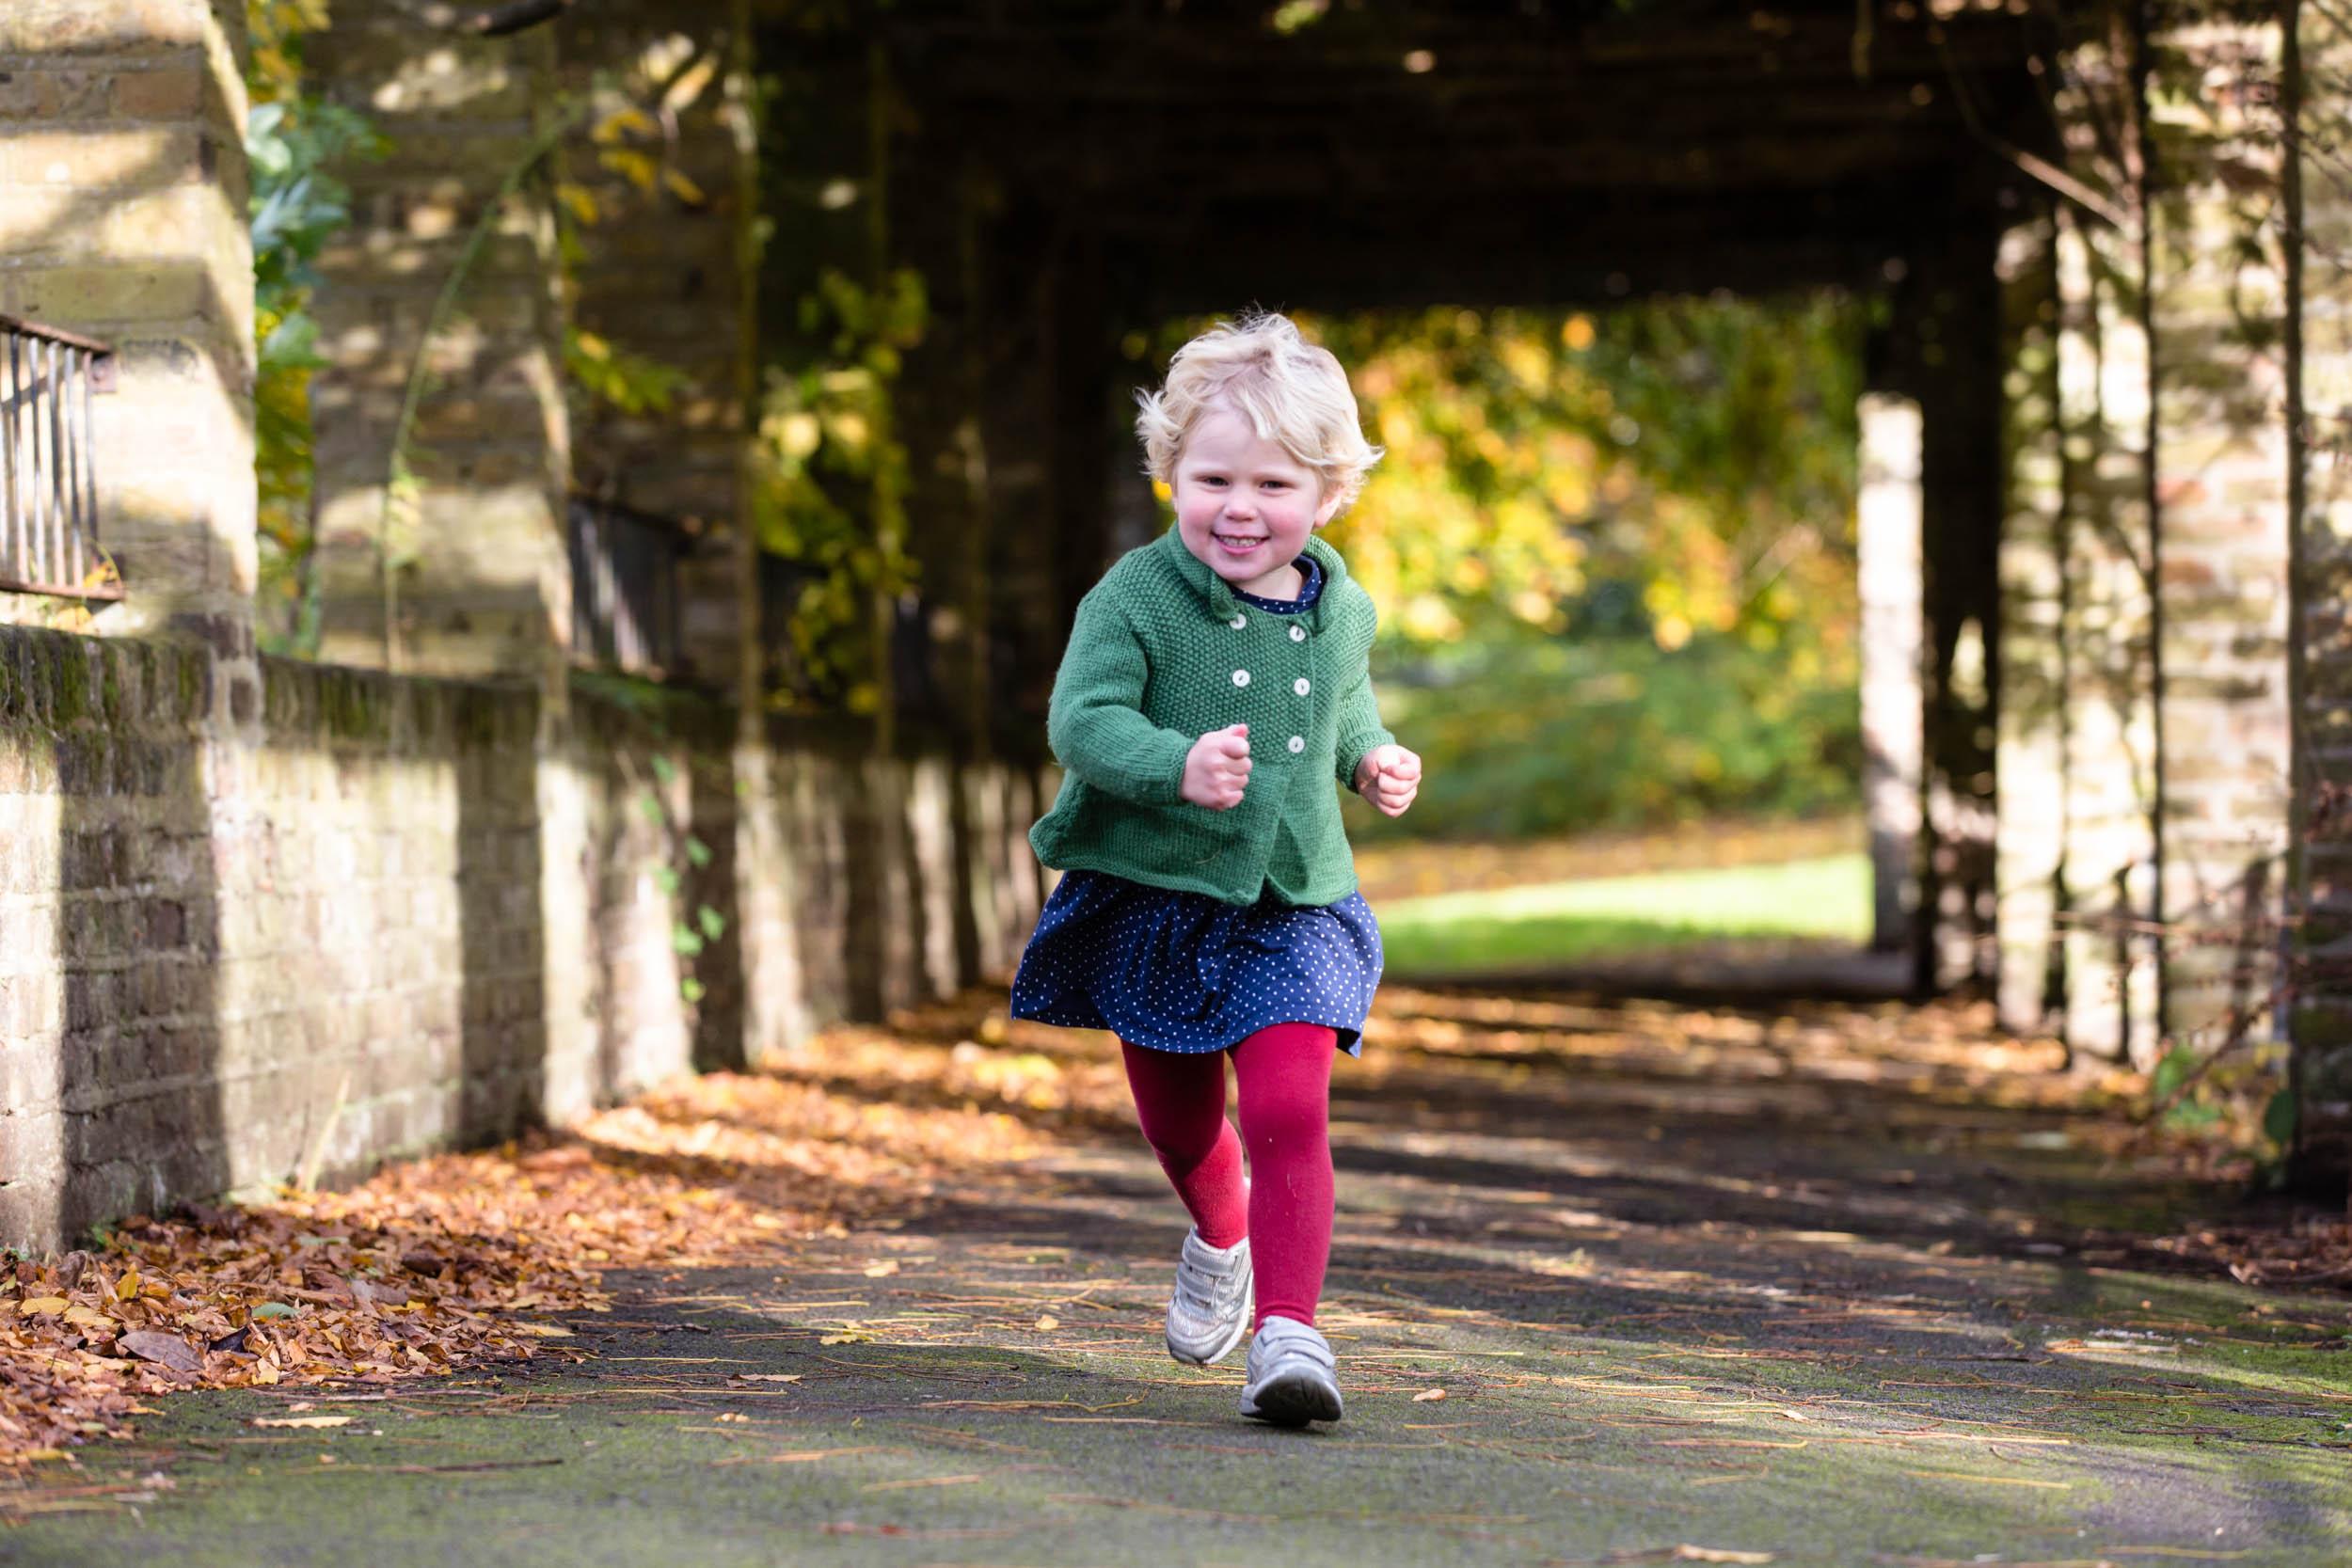 richmond-upon-thames children portrait photographer